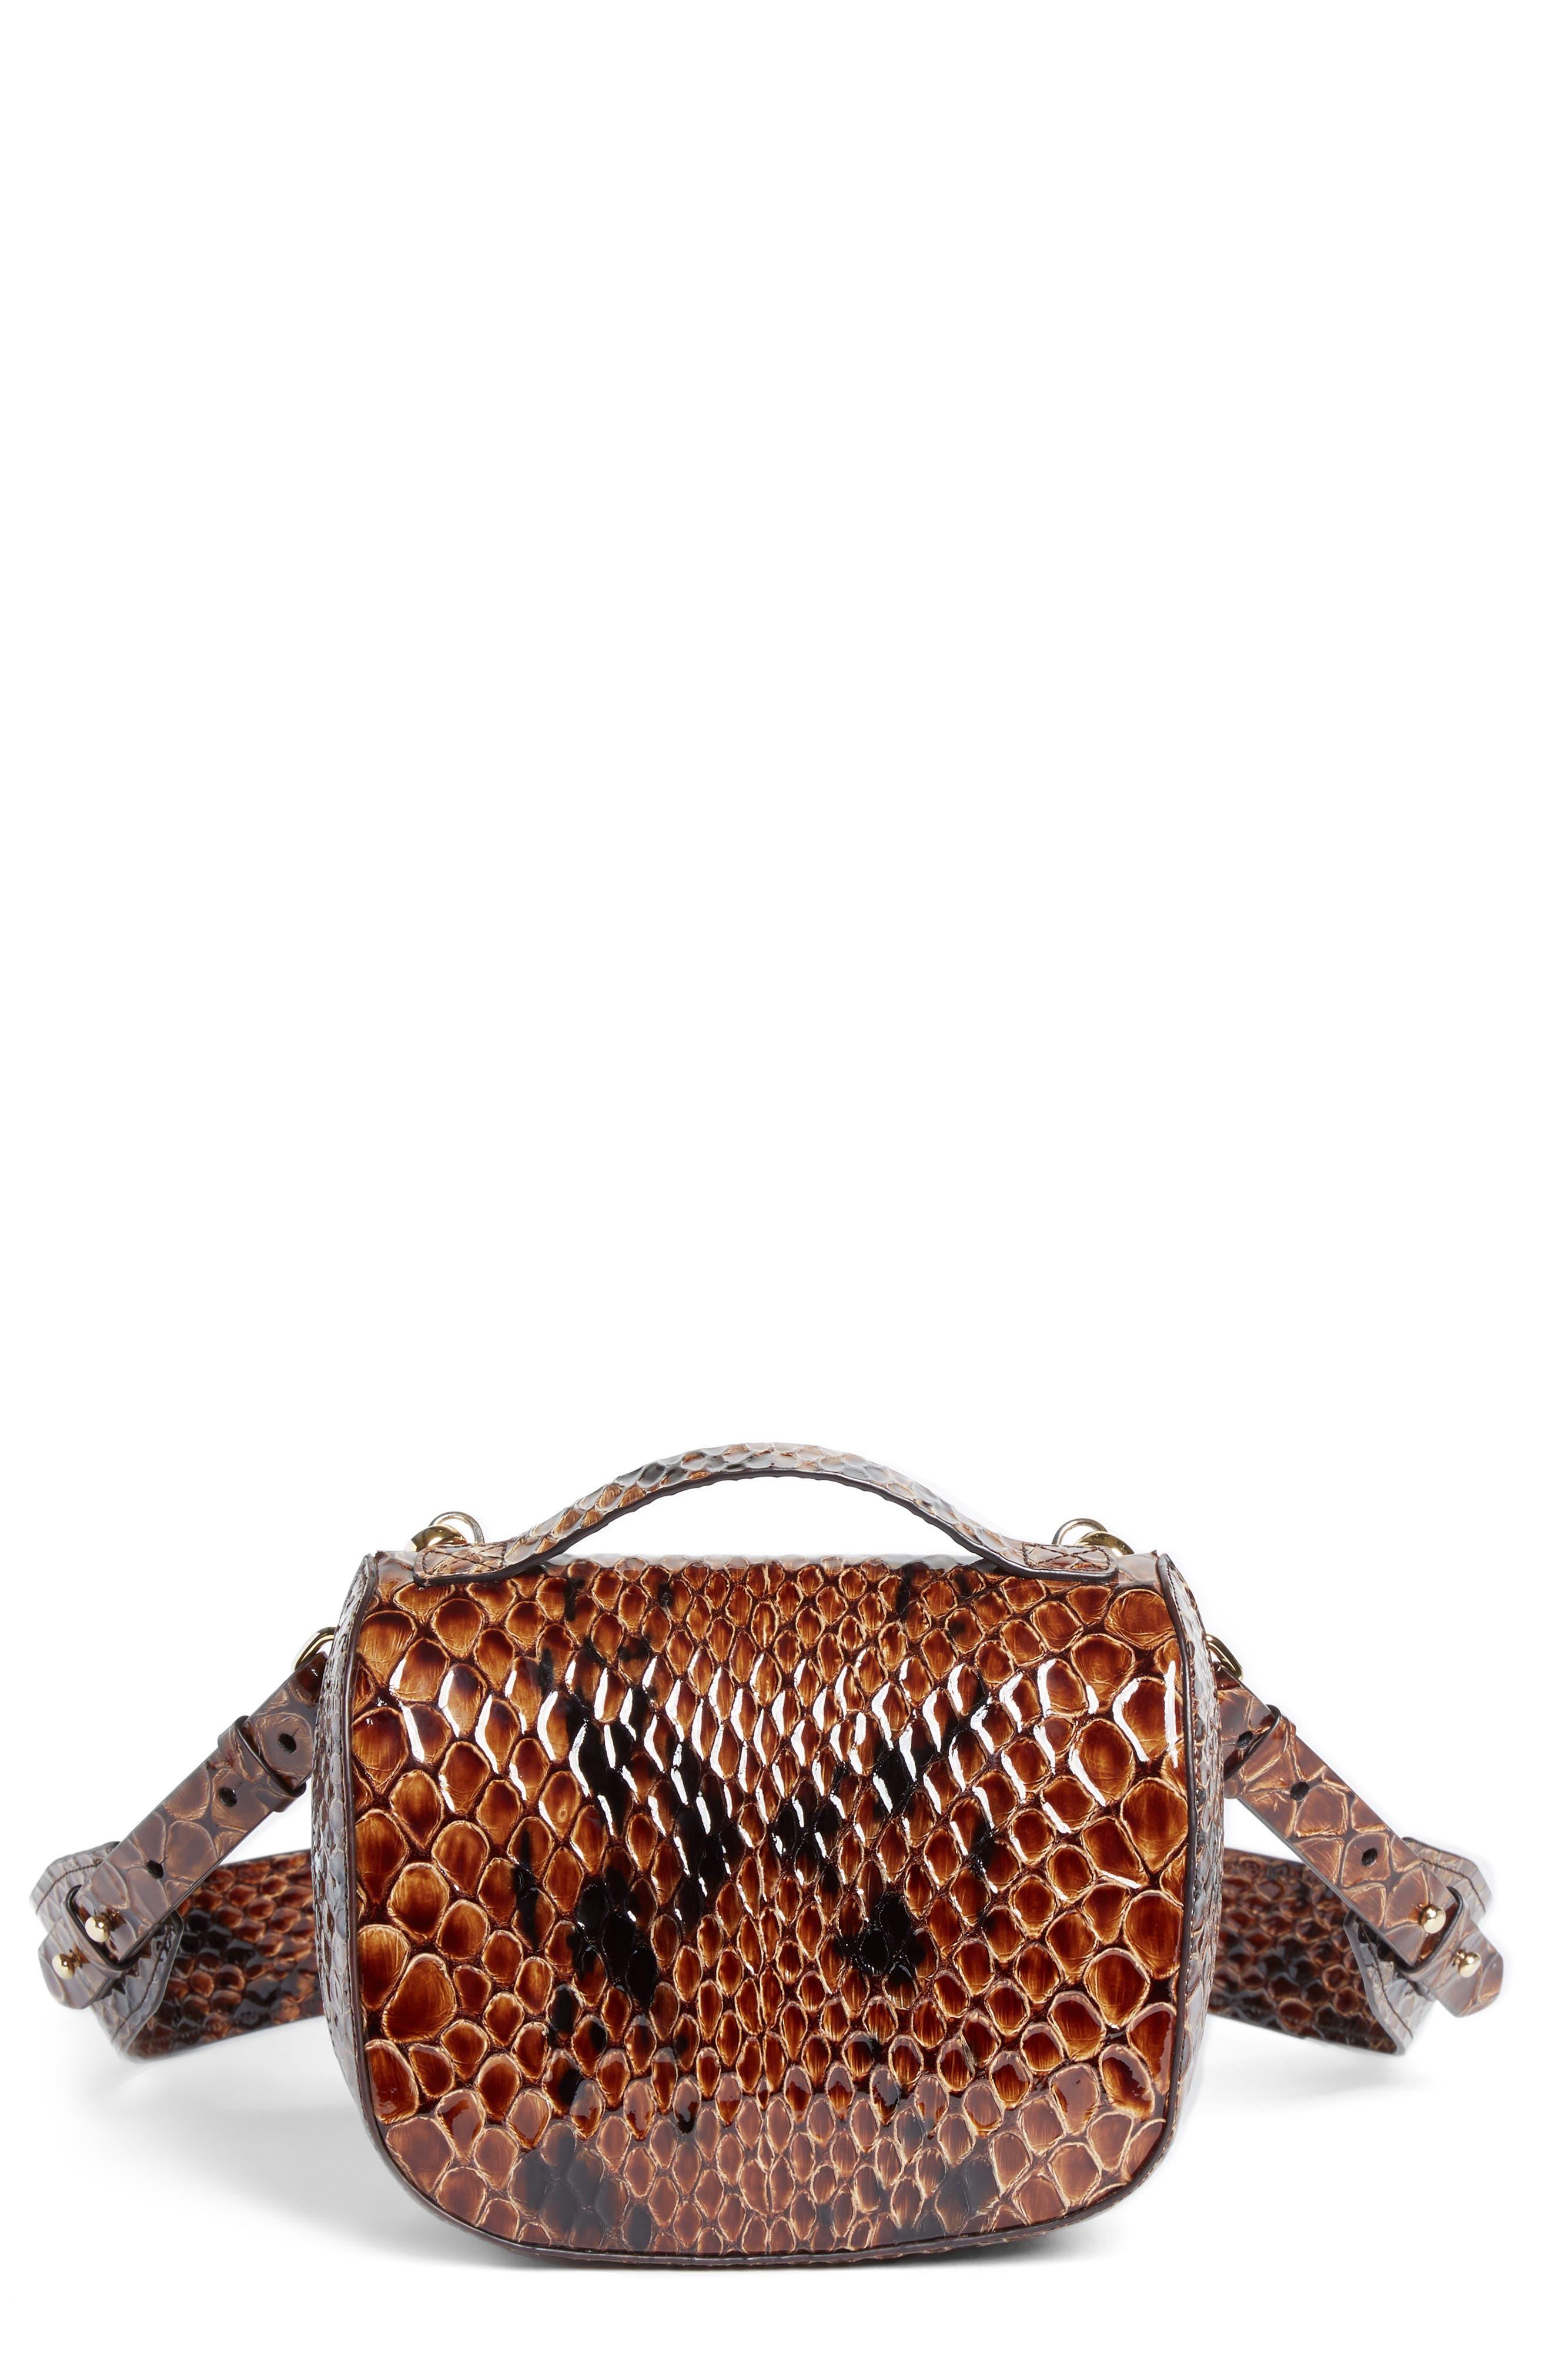 Simone Rocha Small Snake Embossed Leather Box Bag